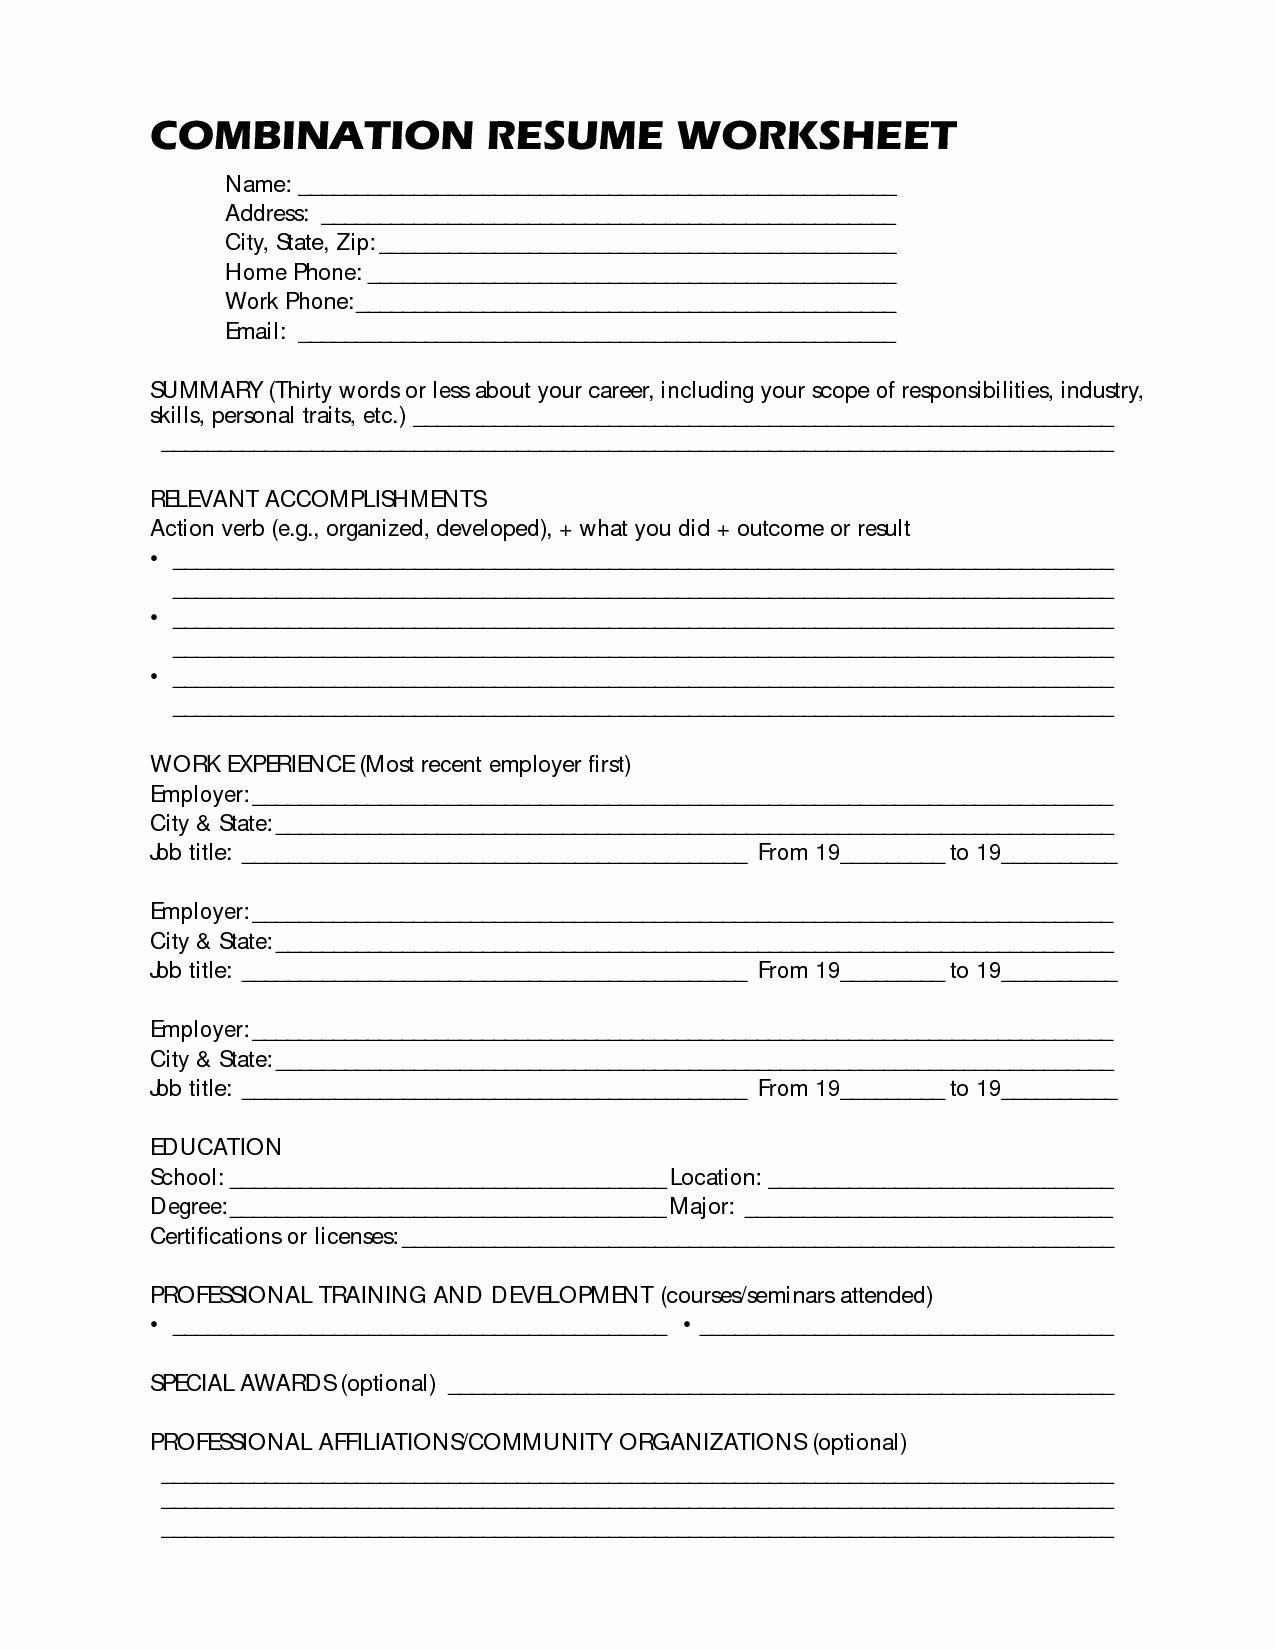 Resume Worksheet for Adults Inspirational 19 Best Of Resume format Worksheet High School